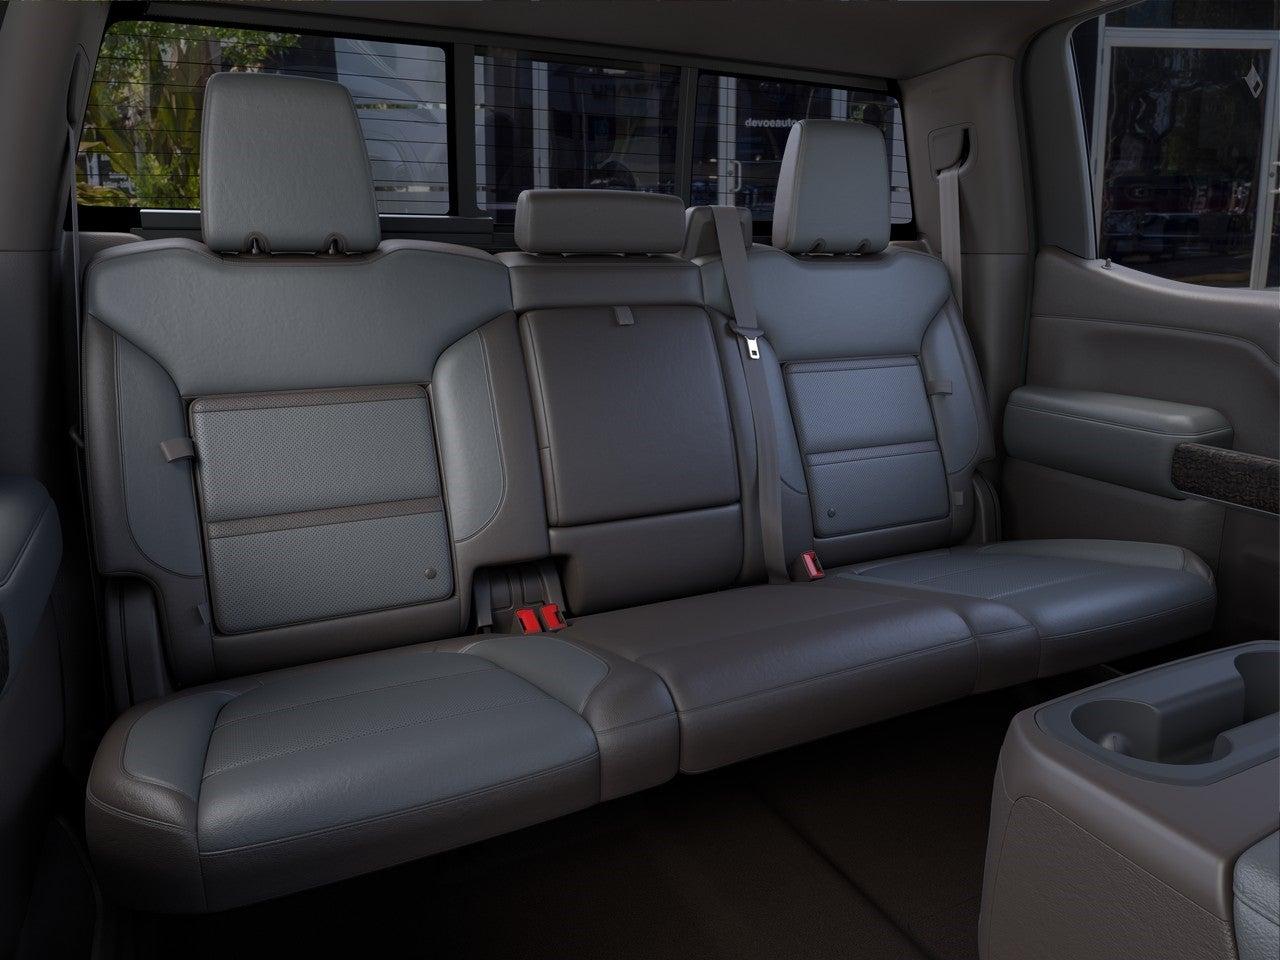 2021 GMC Sierra 1500 Crew Cab 4x2, Pickup #T21145 - photo 33